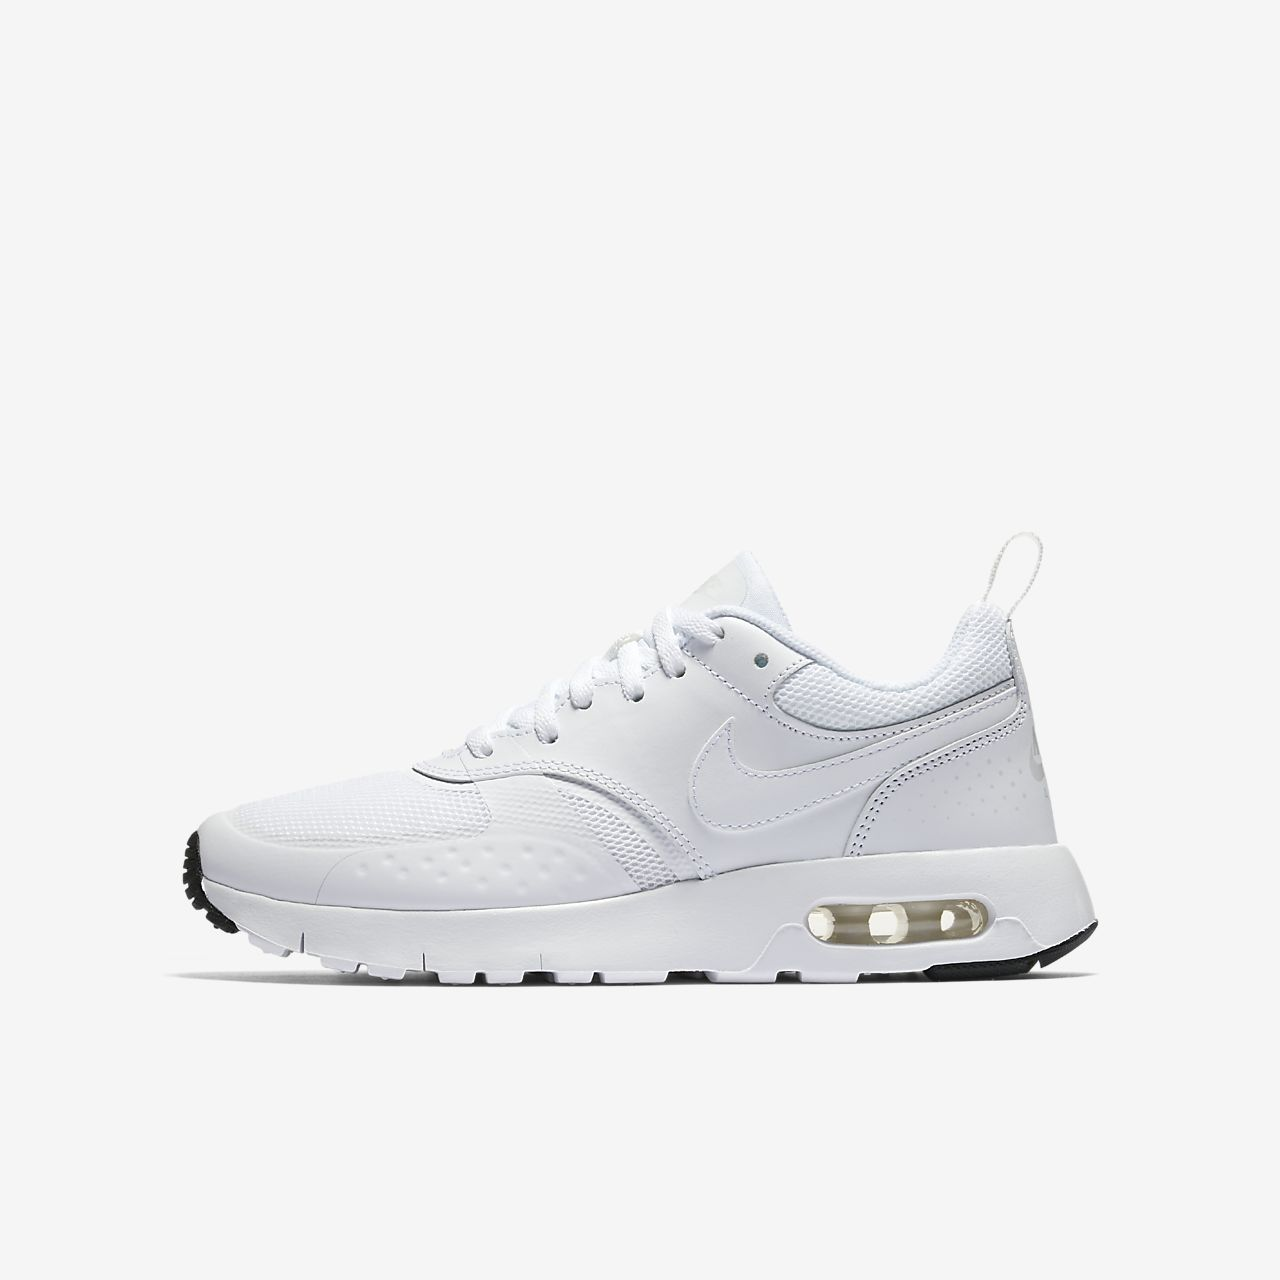 finest selection 4ebf7 00837 ... Sko Nike Air Max Vision för ungdom